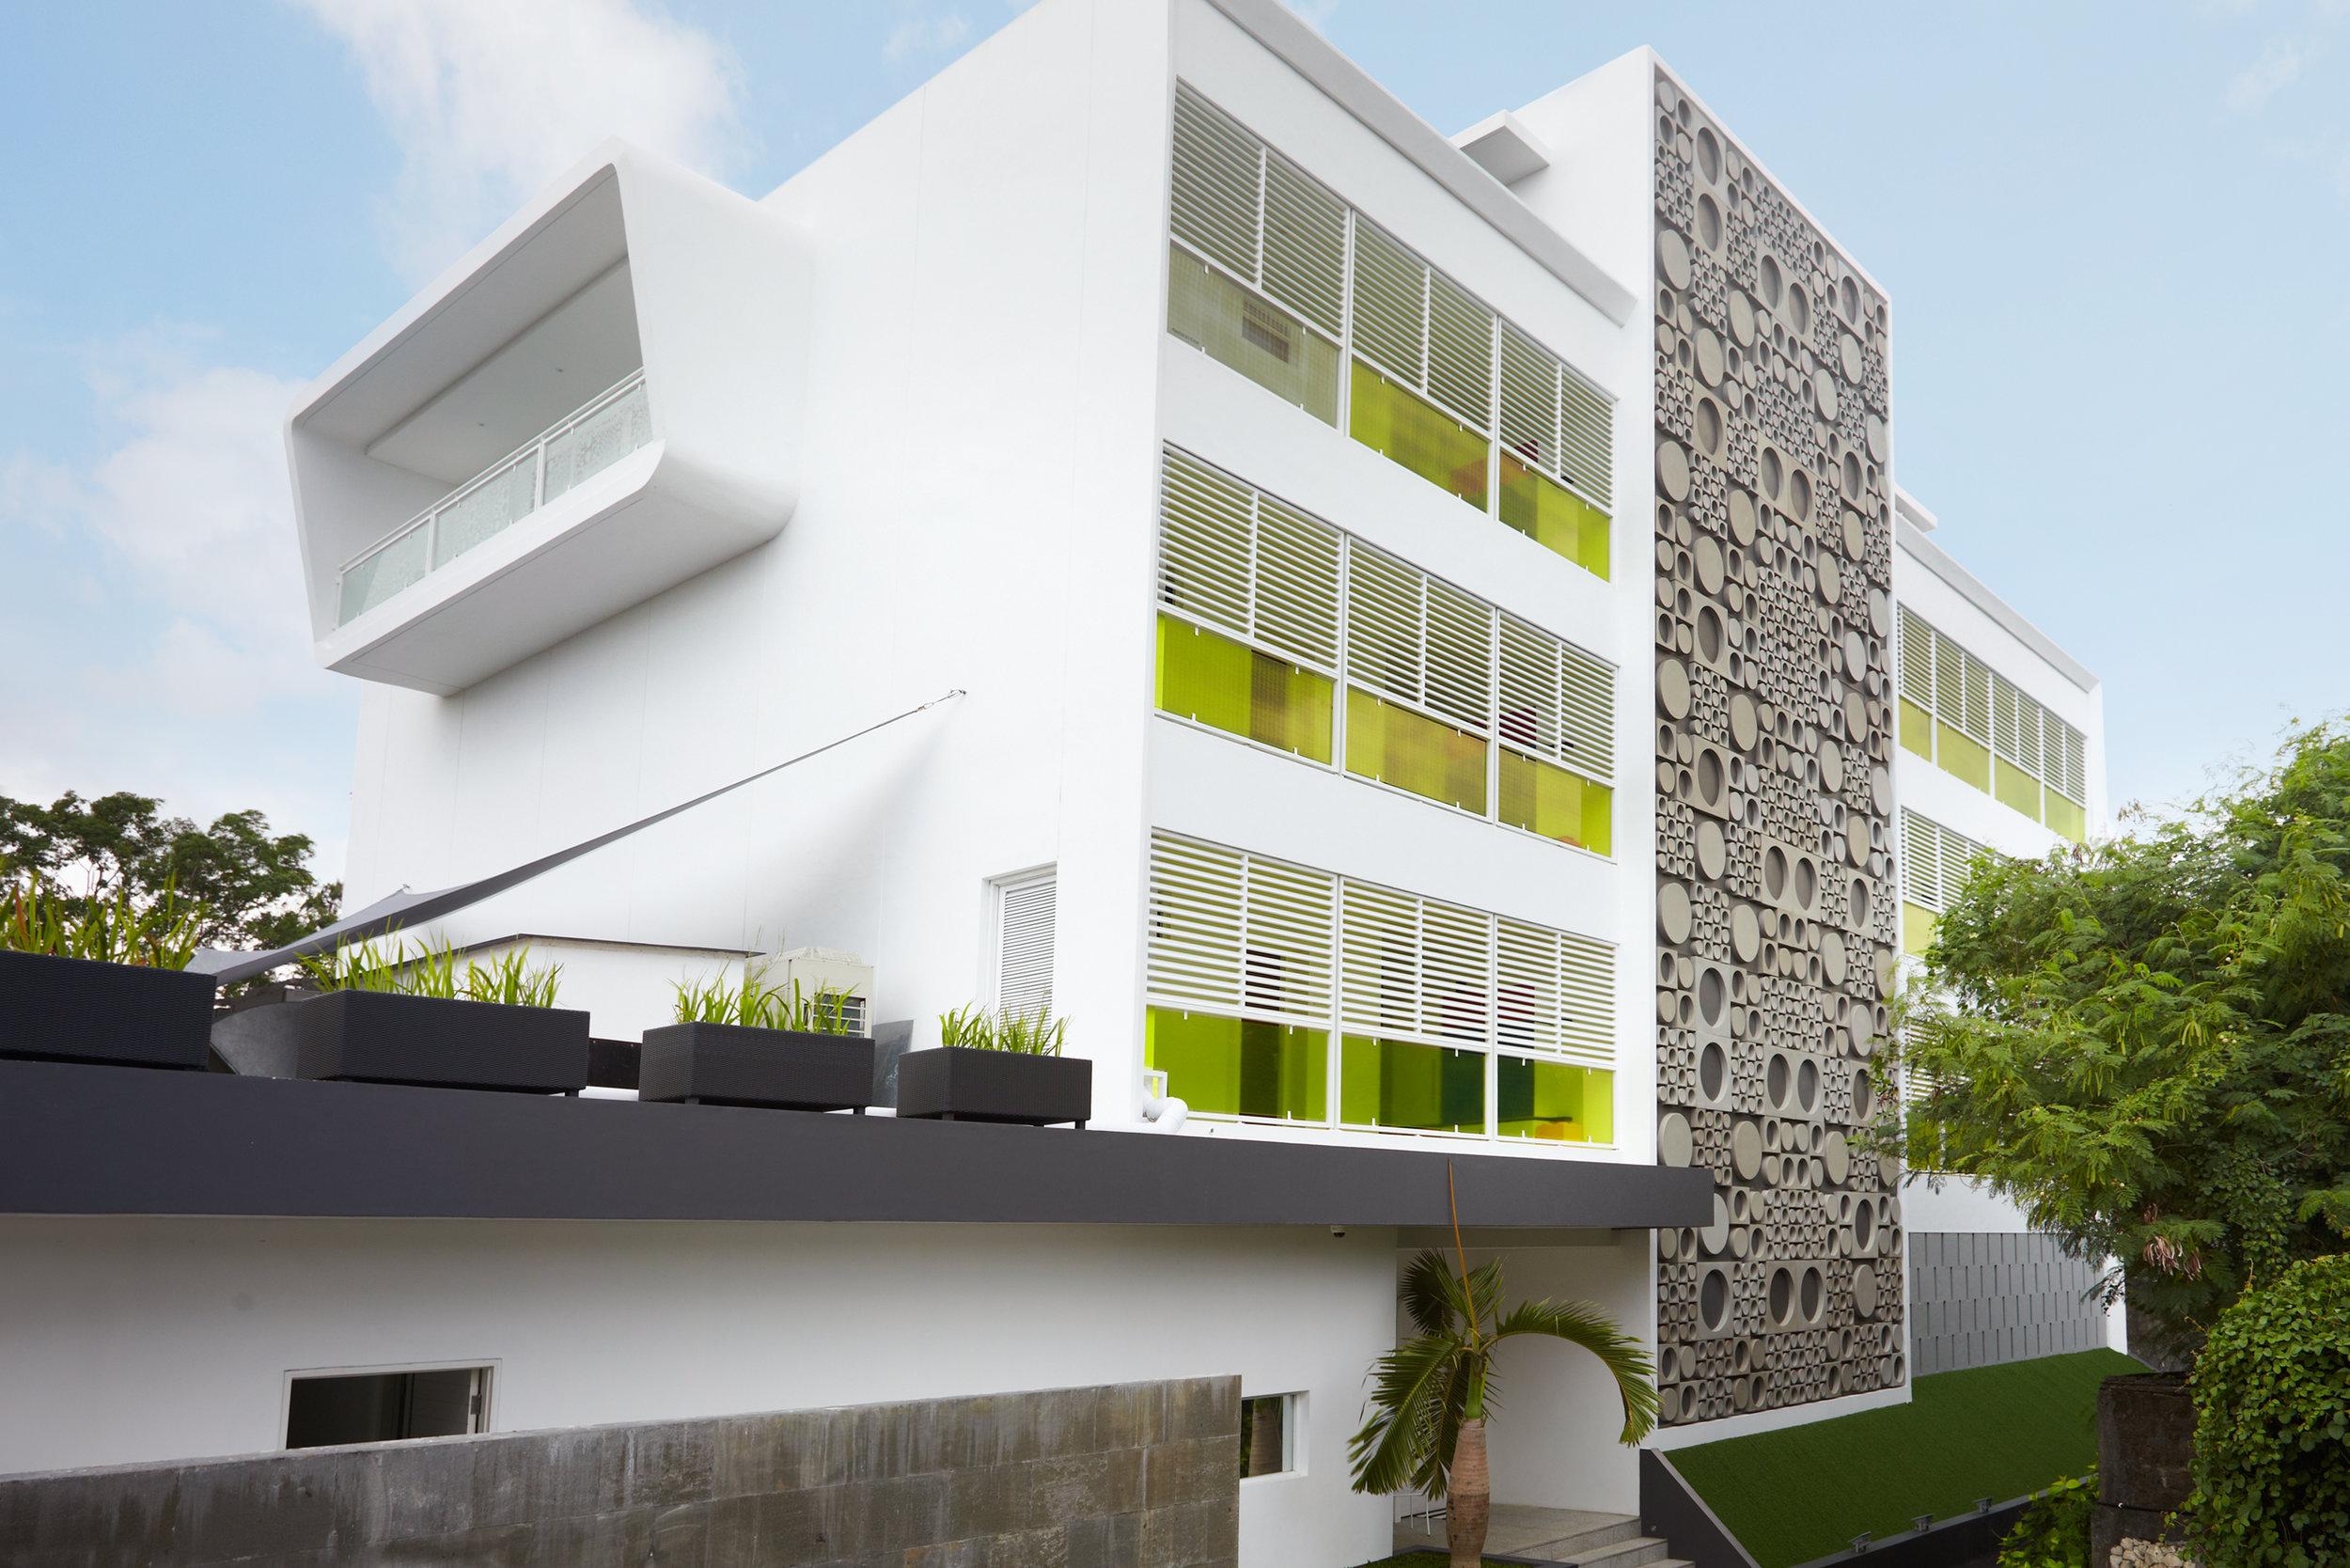 5. Luna2 studiotel architecture.jpg